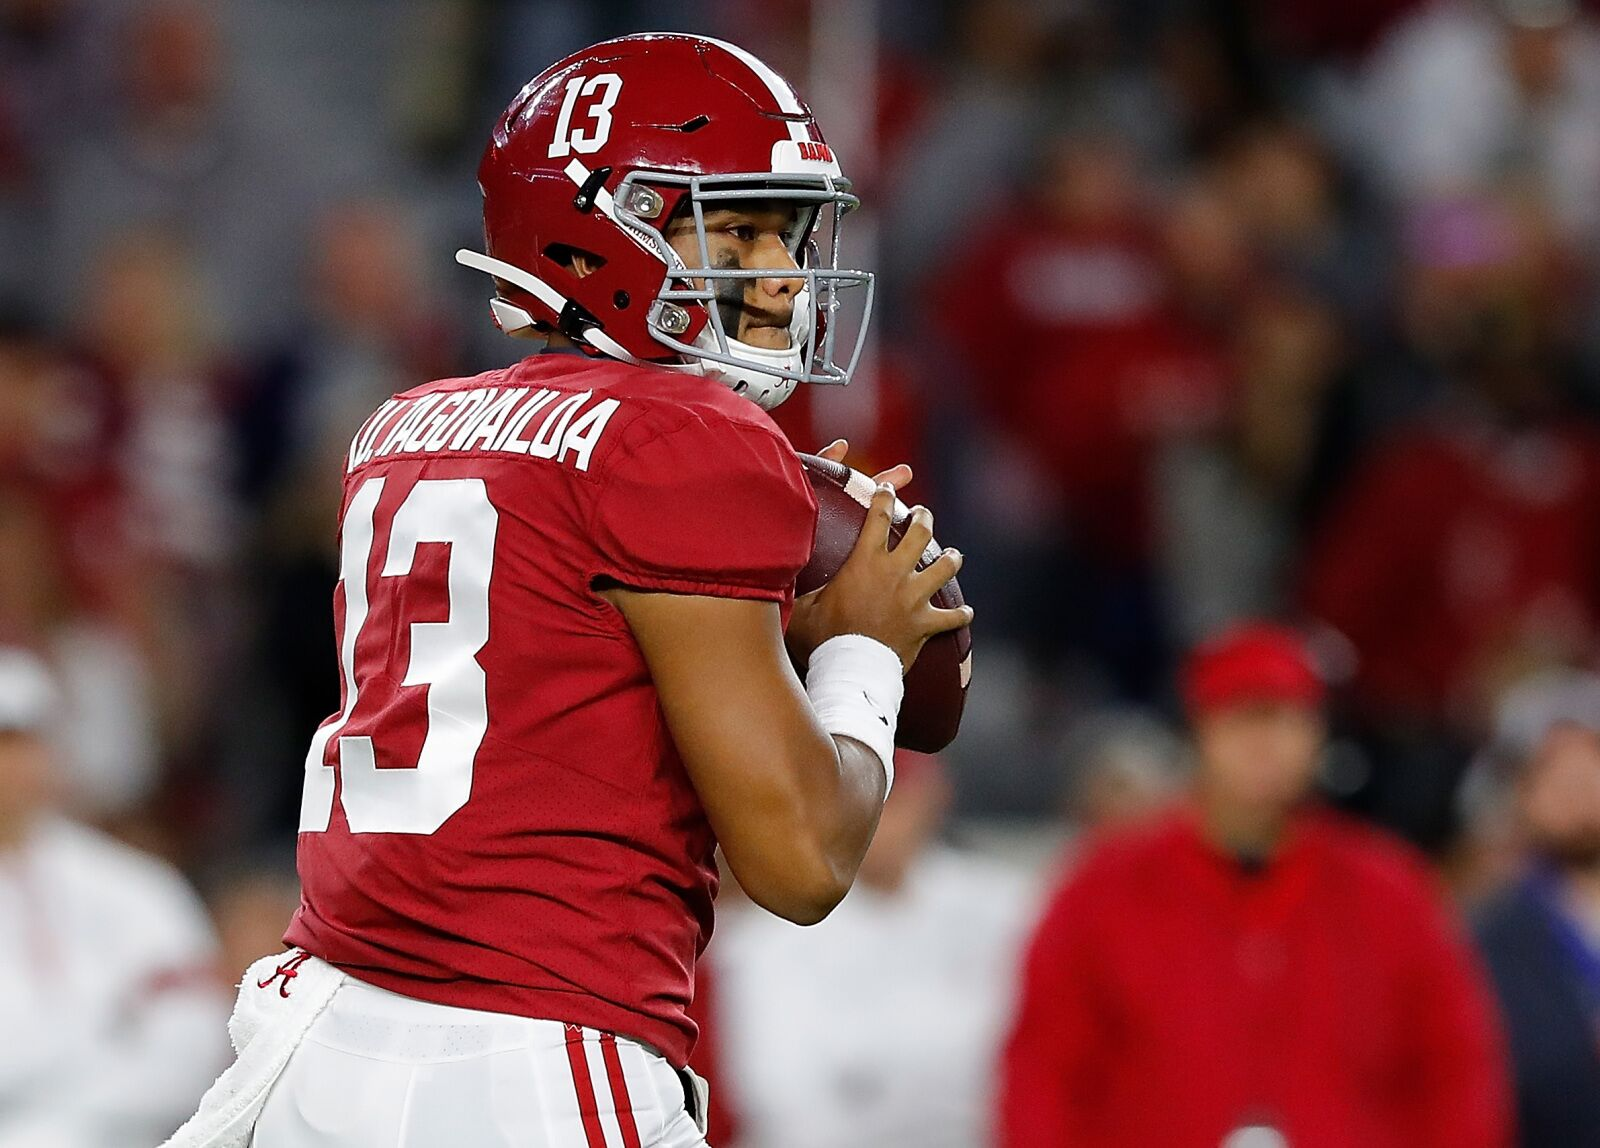 Can Alabama keep rolling without Tua Tagovailoa or Mac Jones?